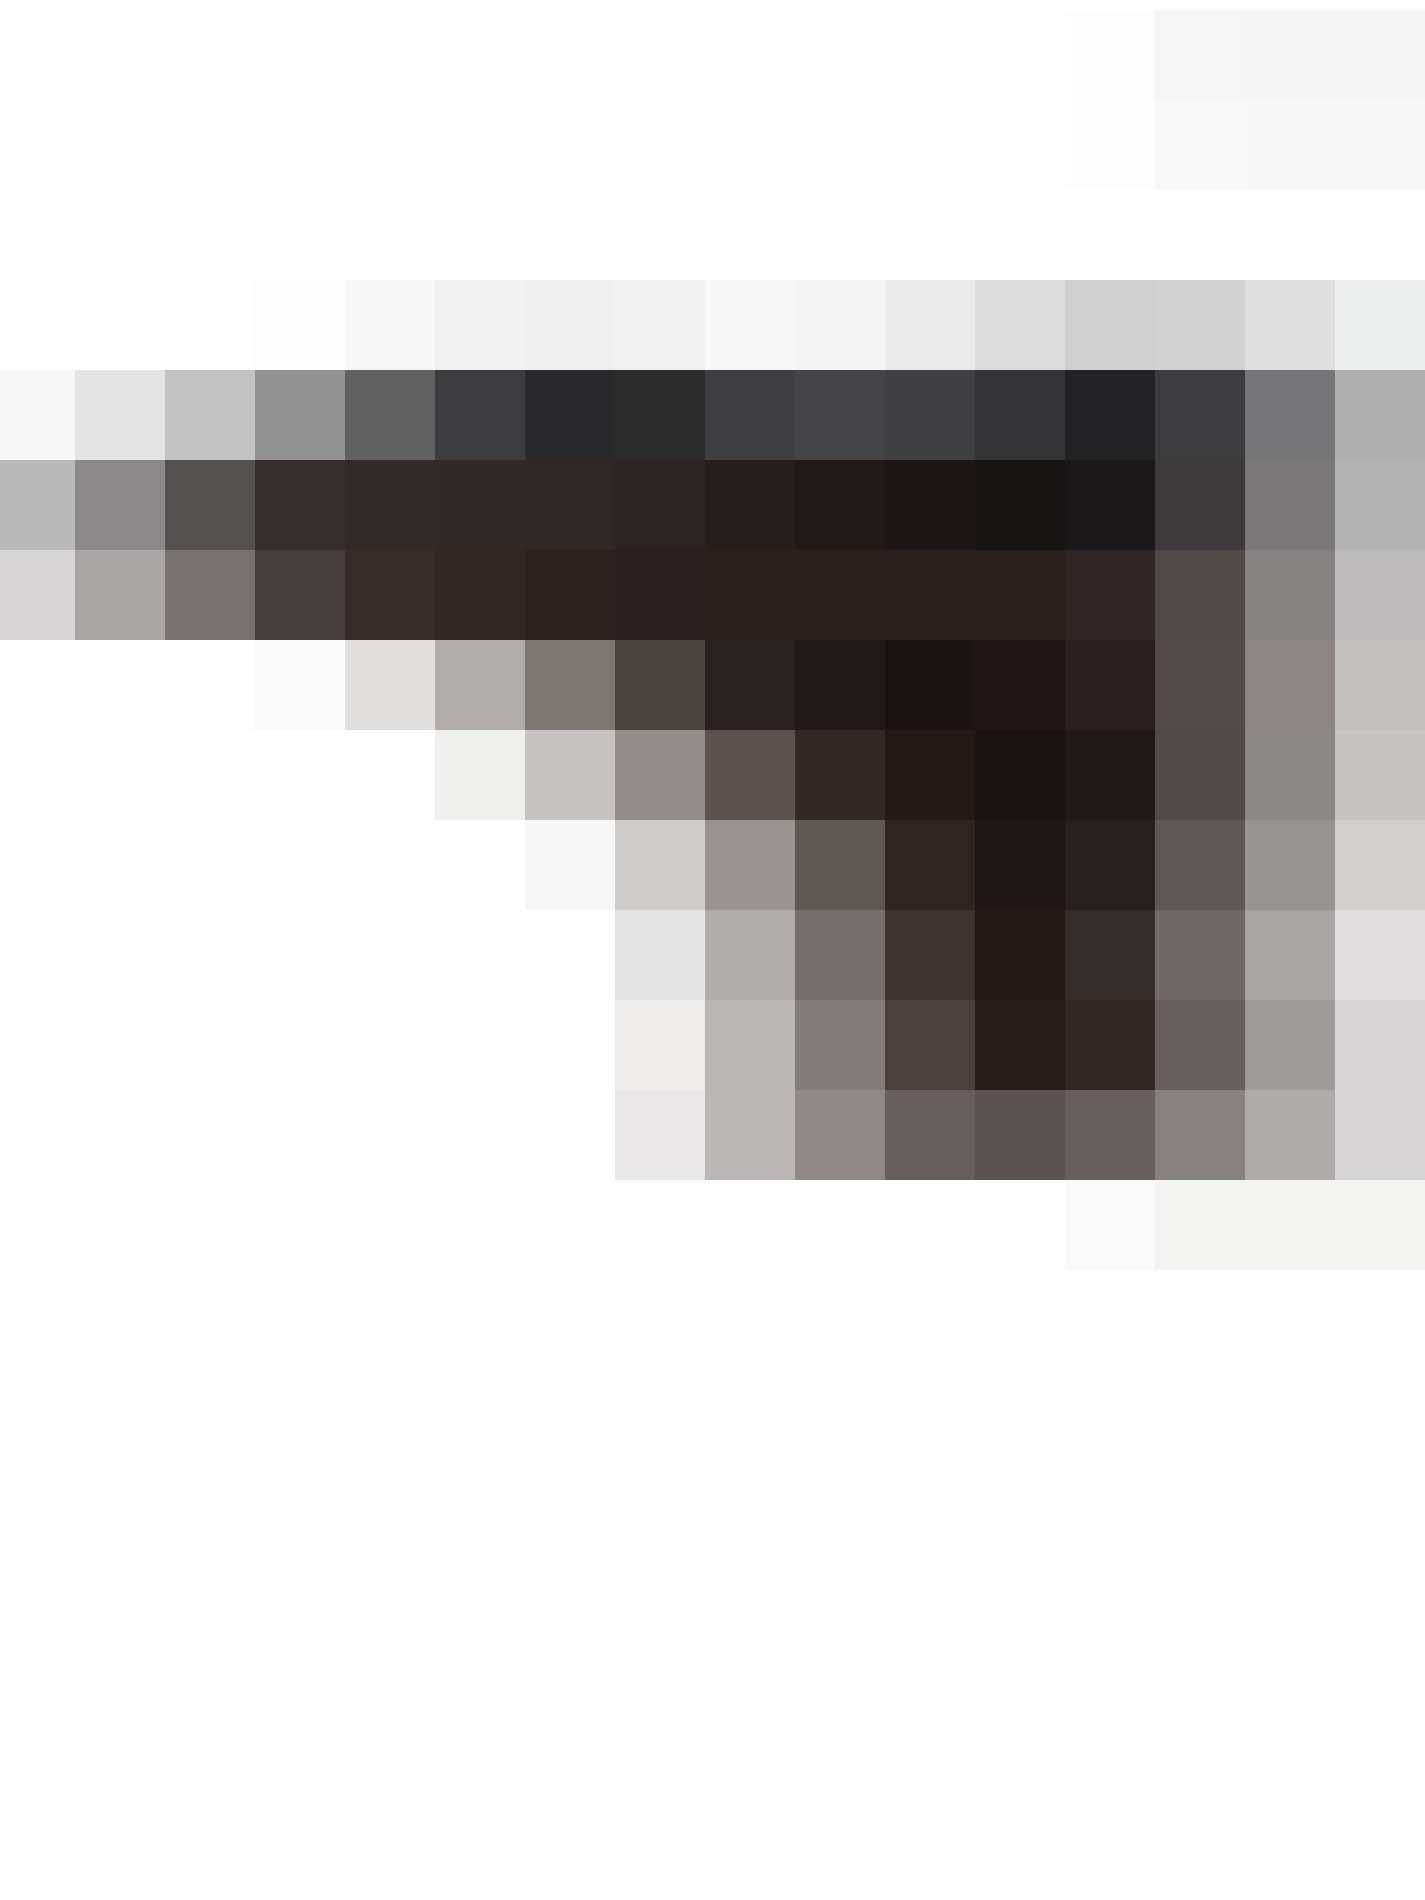 745549-0099_1